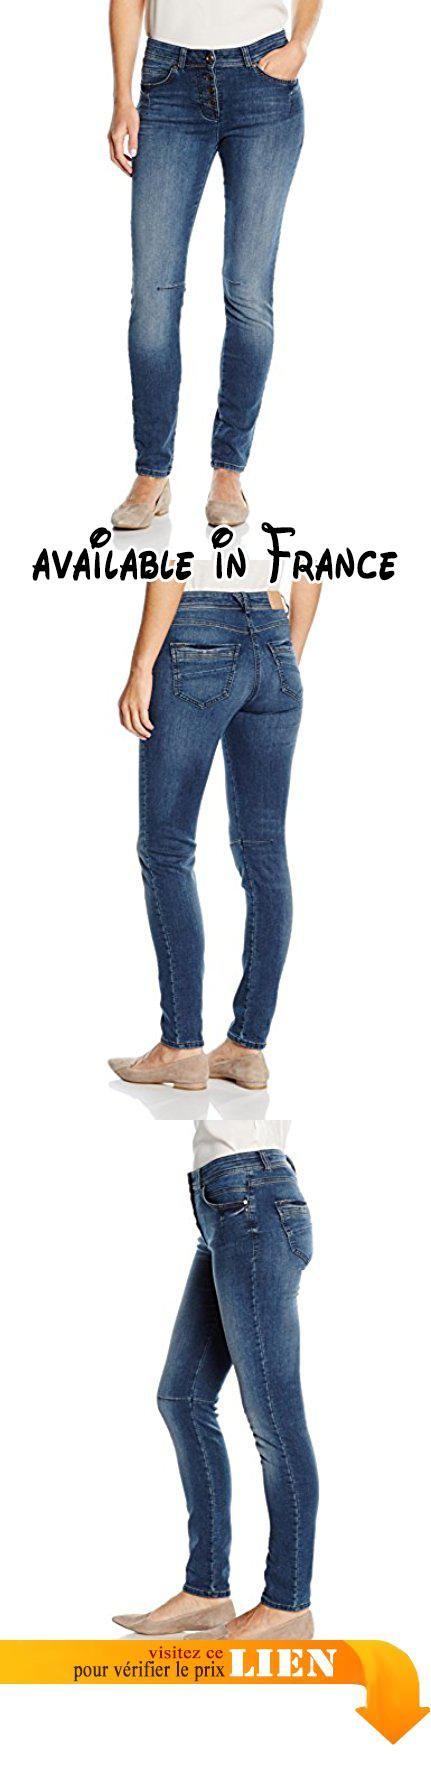 B01AT62KJI : Bonita Jeans 30 inch mid stone wash denim - Jeans - Relaxed - Femme Bleu (mid-stone wash denim 1052) 38.